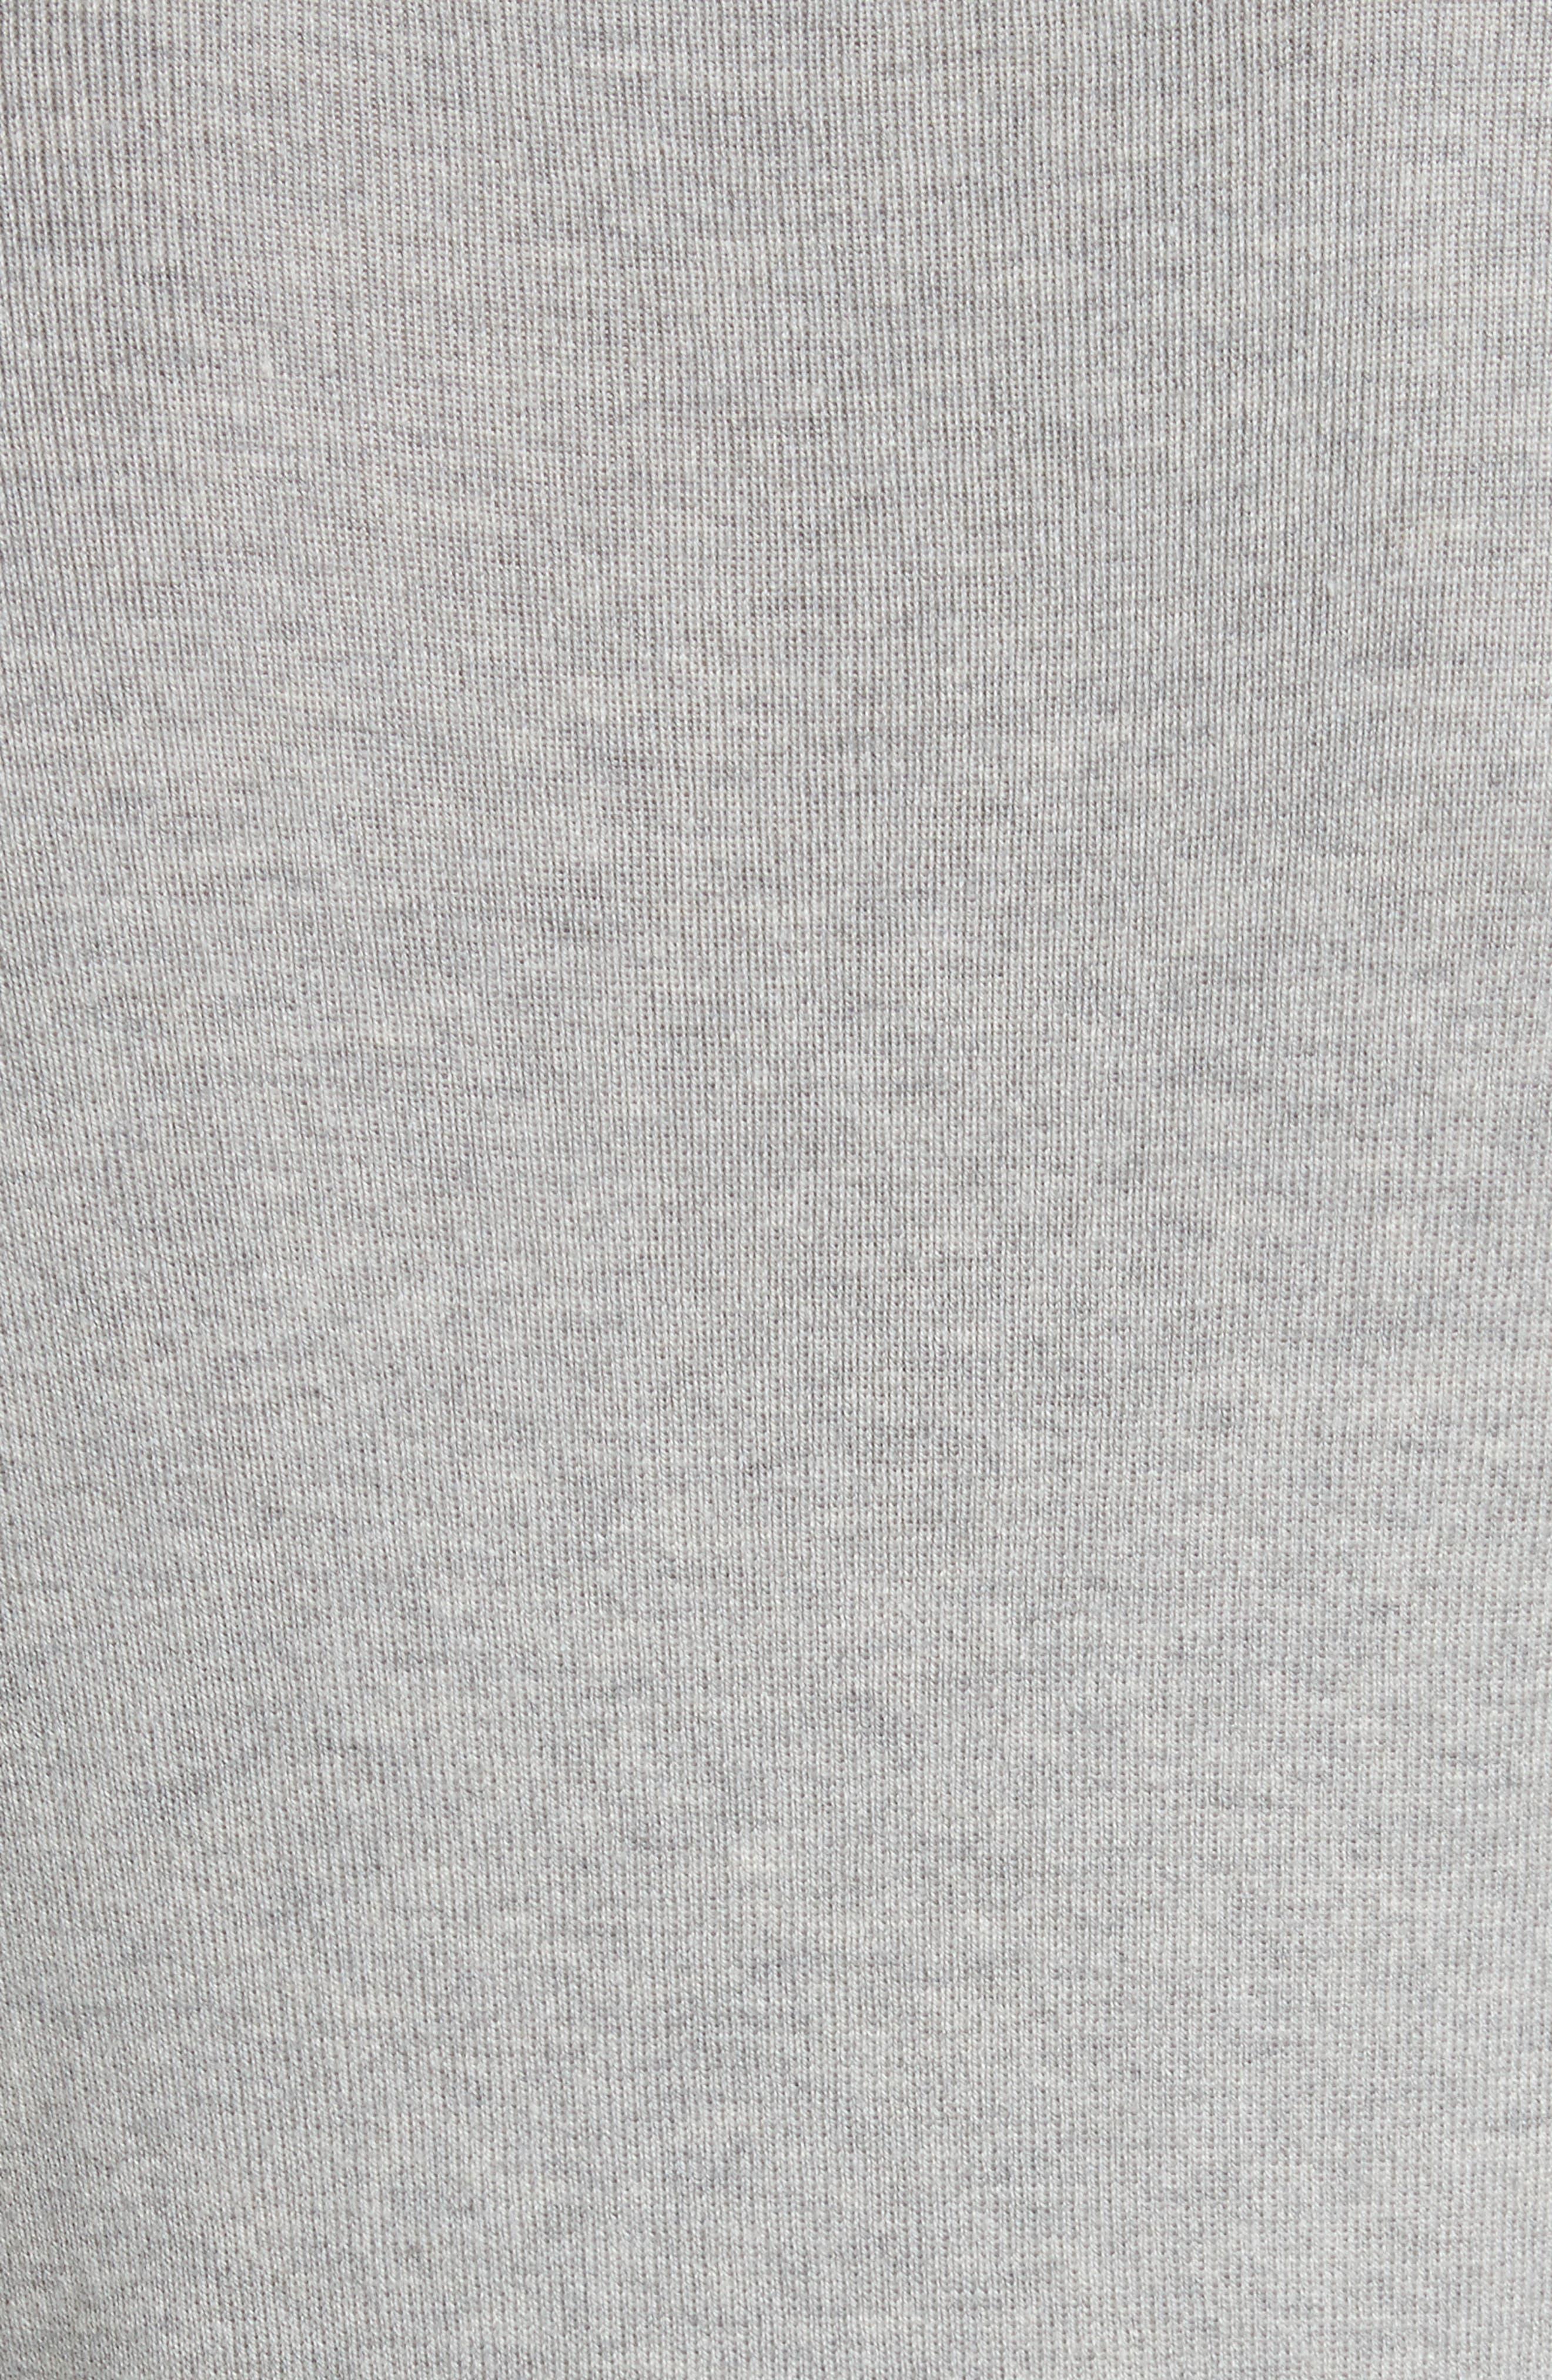 Karley Minerals Mockable Sweater,                             Alternate thumbnail 5, color,                             Light Grey